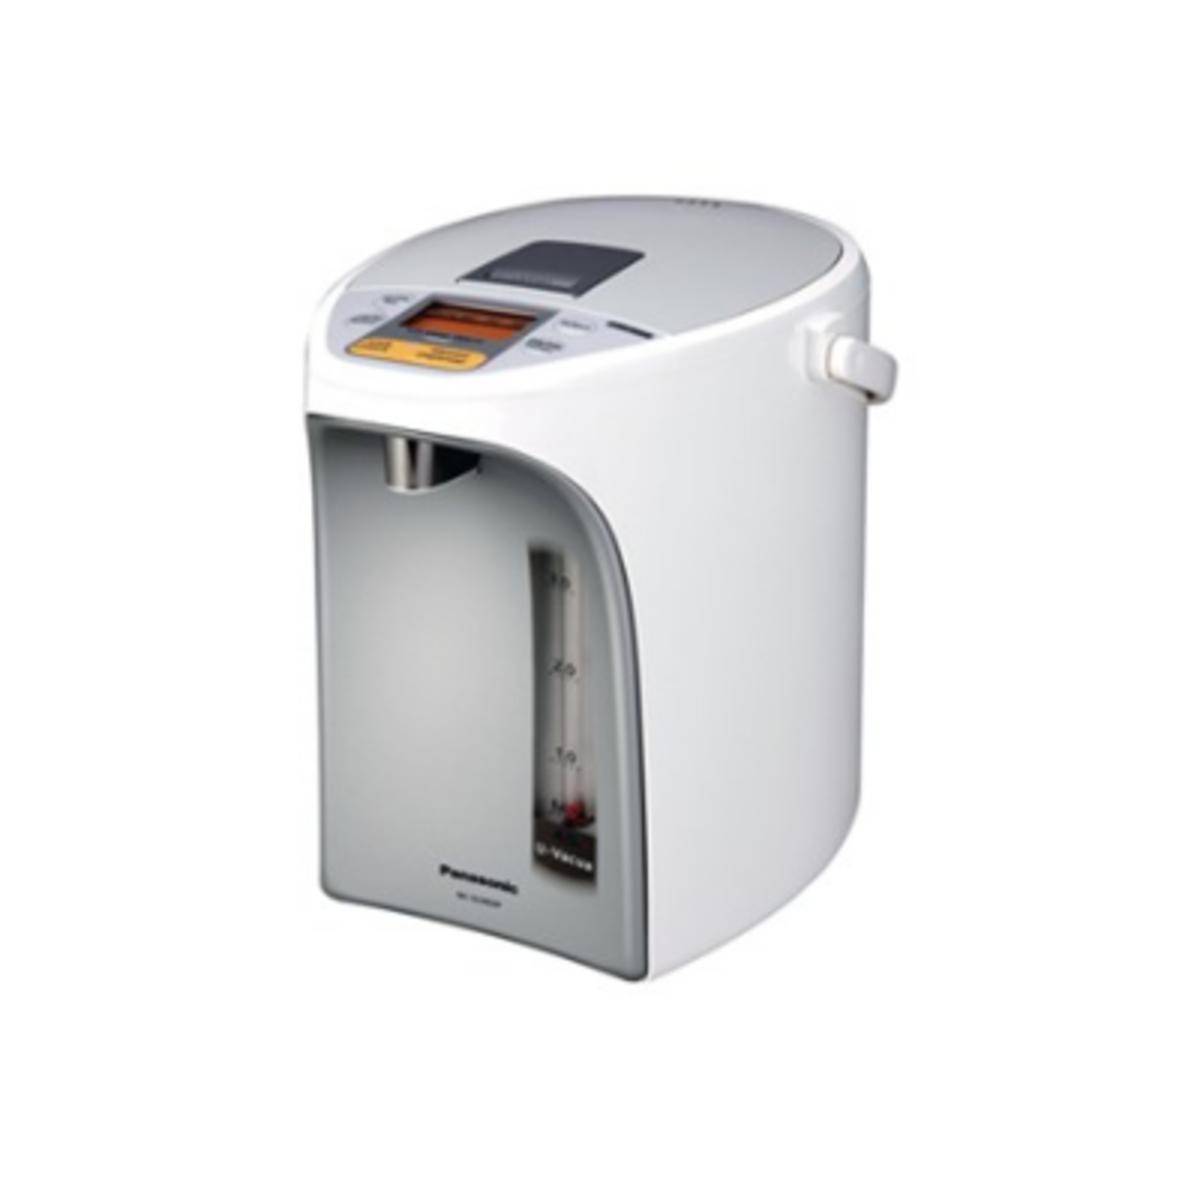 Panasonic | NC-SU403P Electric Or Cordless Electric Pump Thermo Pot ...